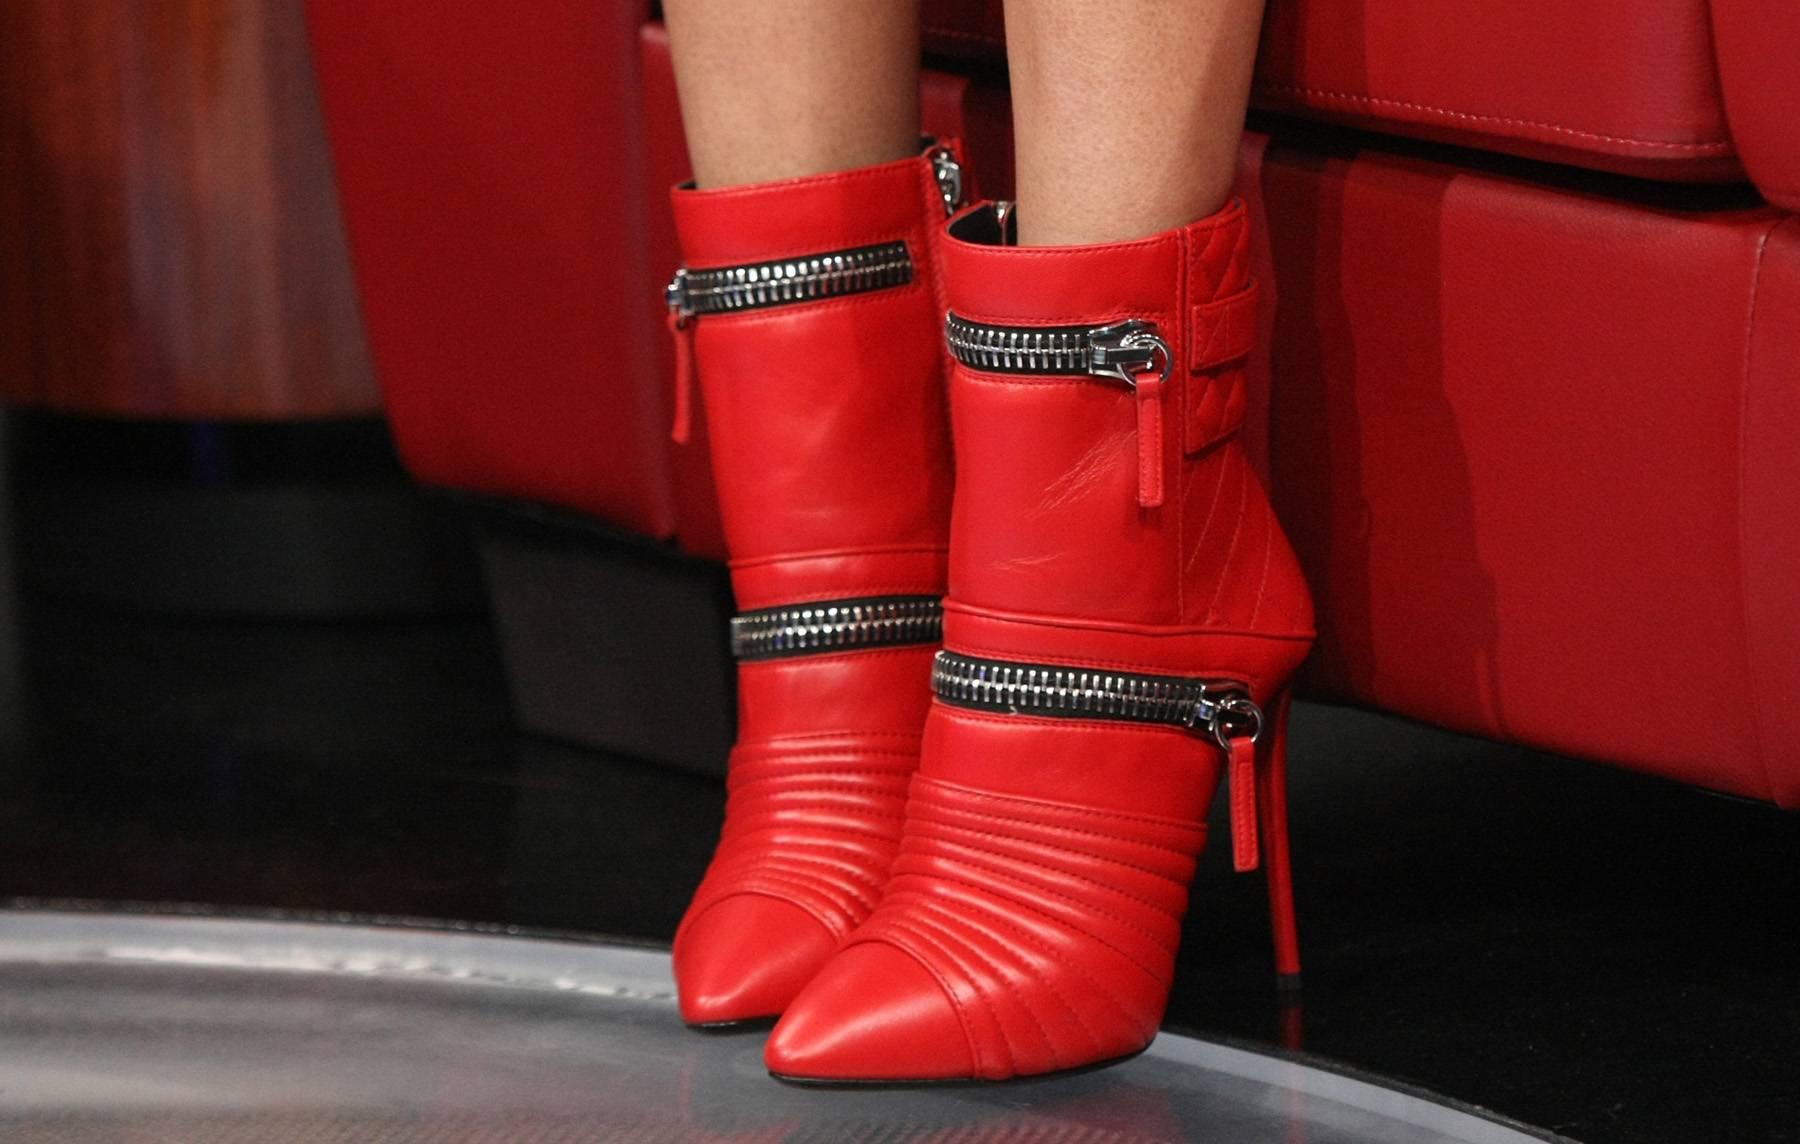 Red Hot - (Photo: Bennett Raglin/BET/Getty Images)